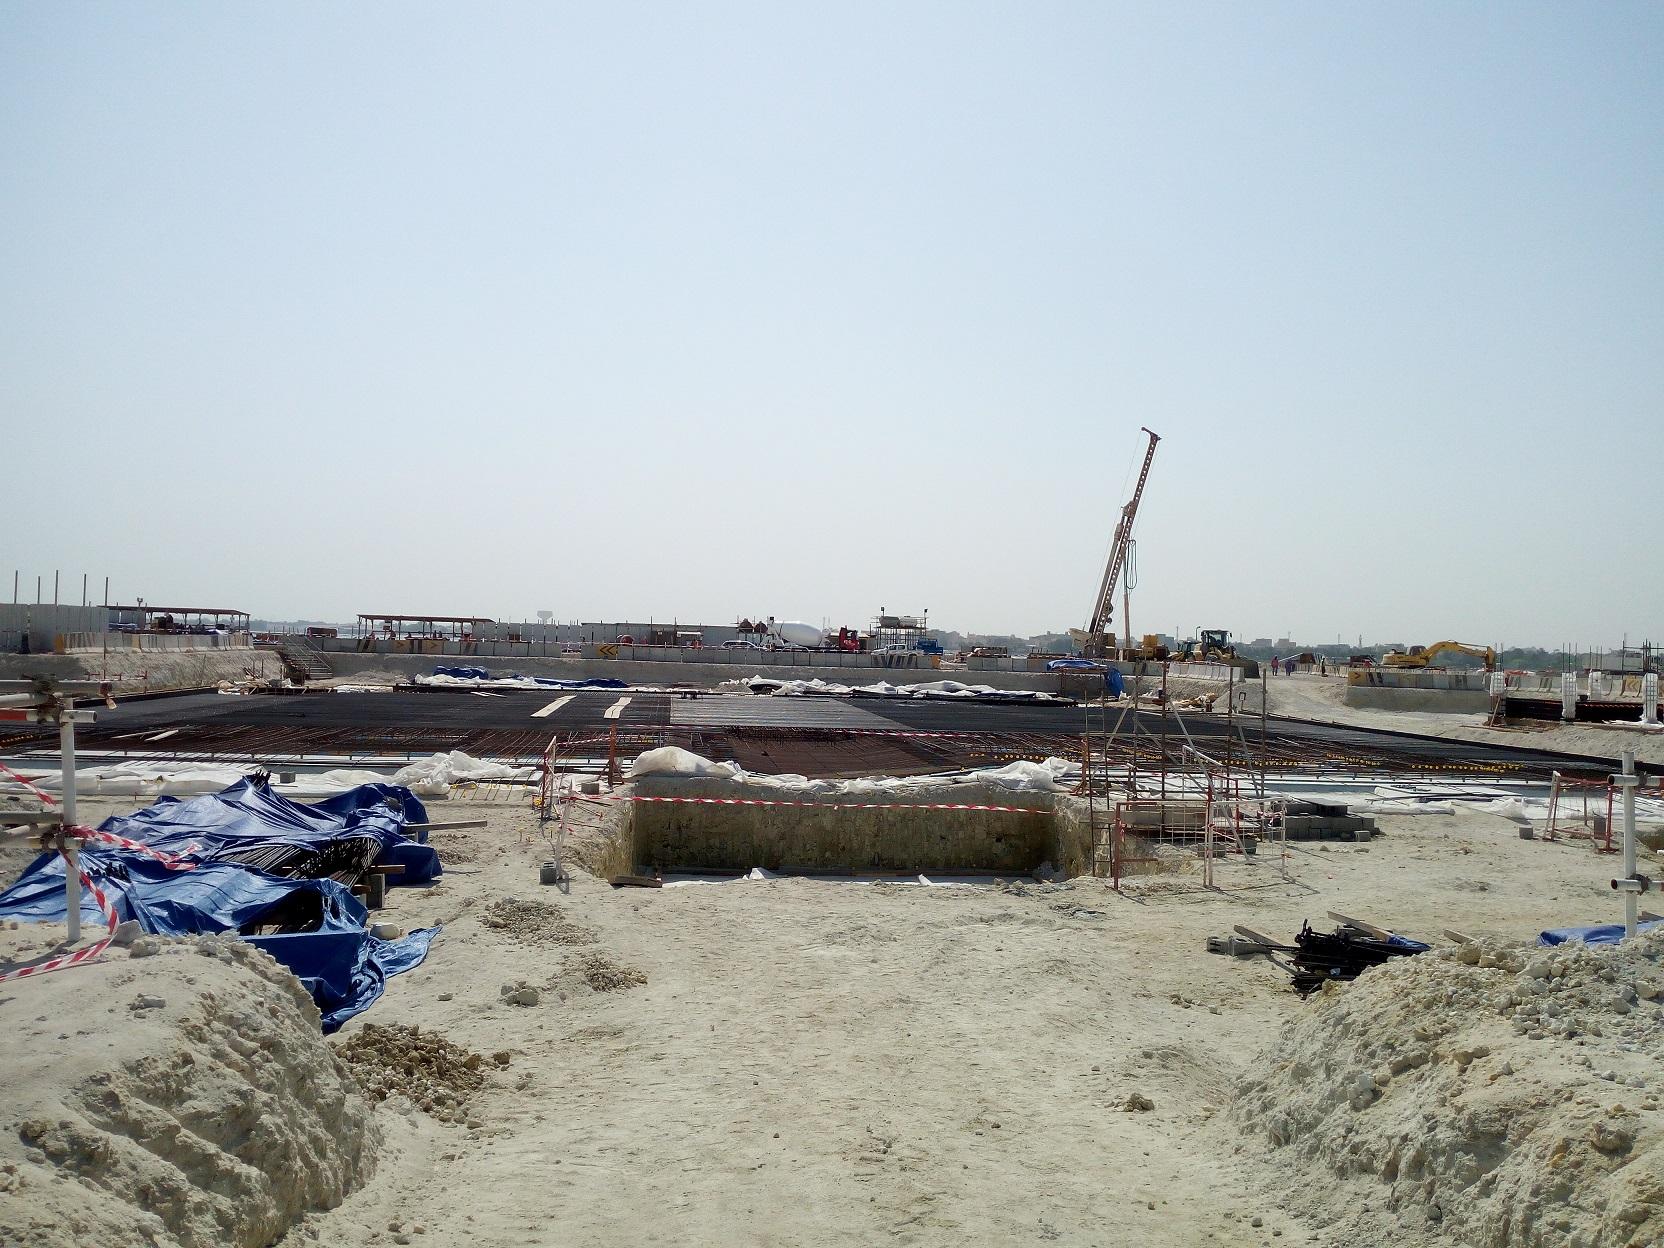 Al Madina Al Shamaliya Sewage Treatment Plant